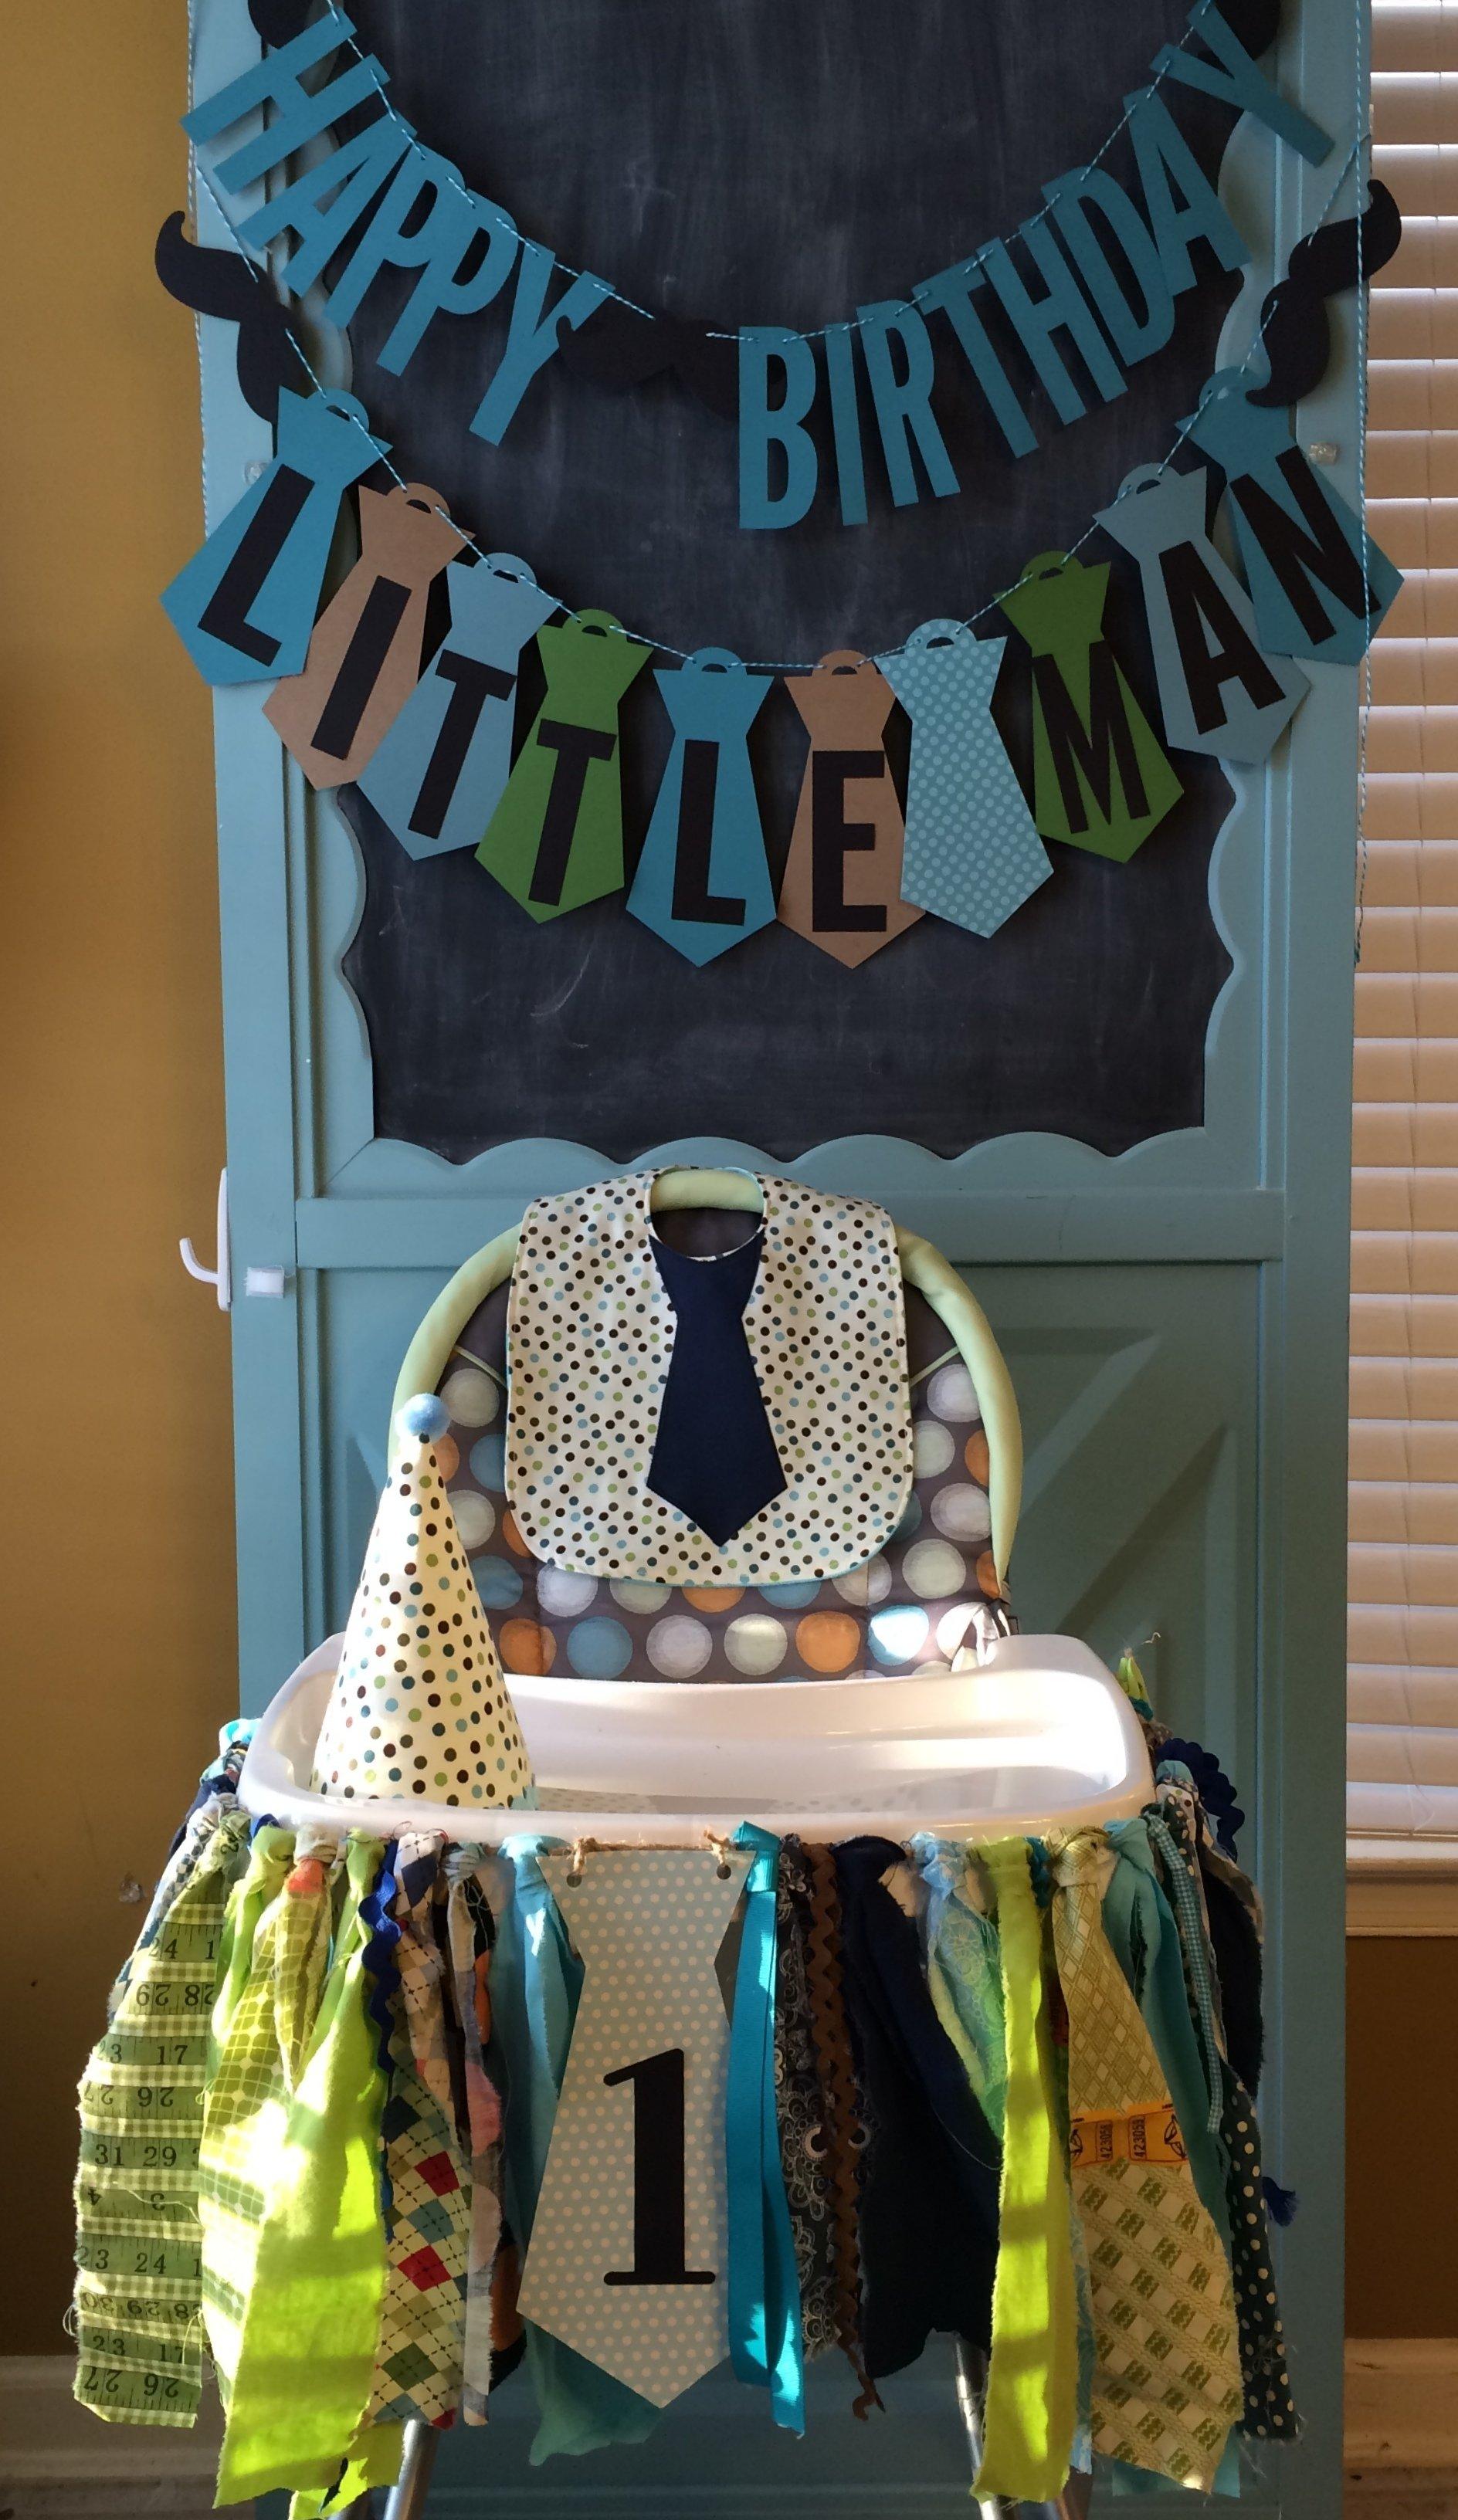 10 Attractive First Birthday Ideas For Boys boys first birthday party ideas 1 2021